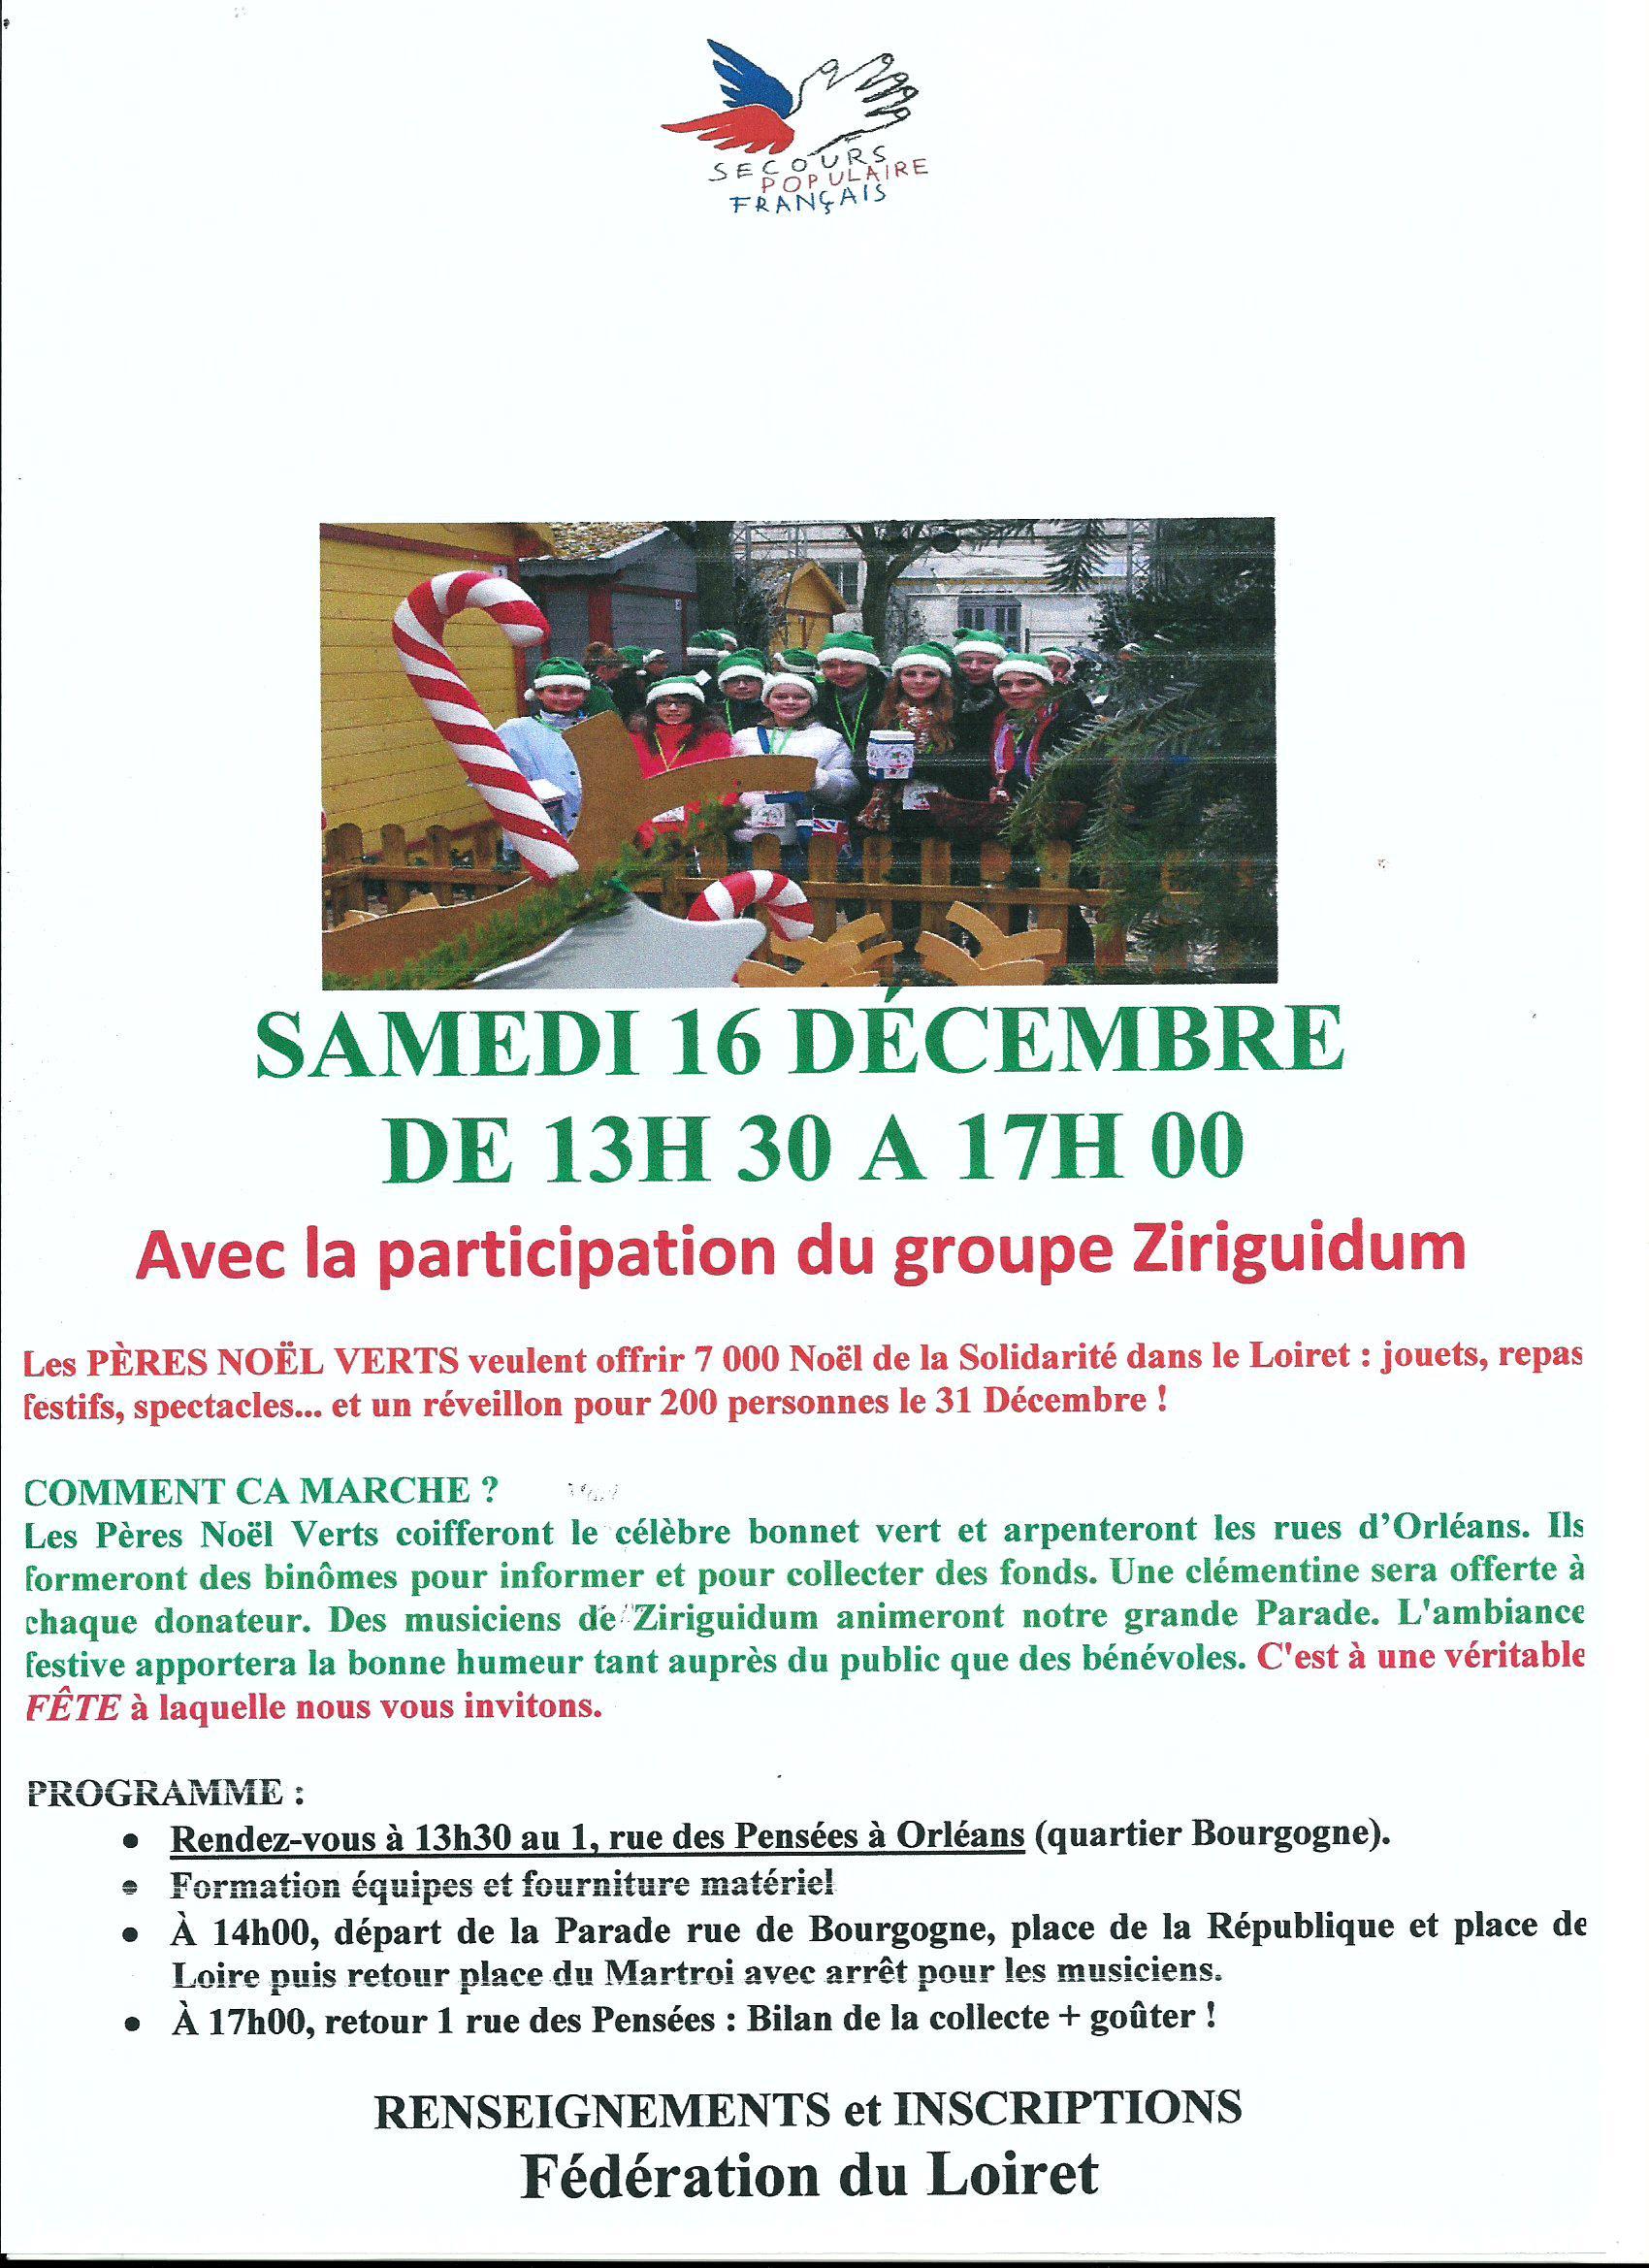 Scan Affiche les père noël verts 2017 SPF (16.12.2017).jpg